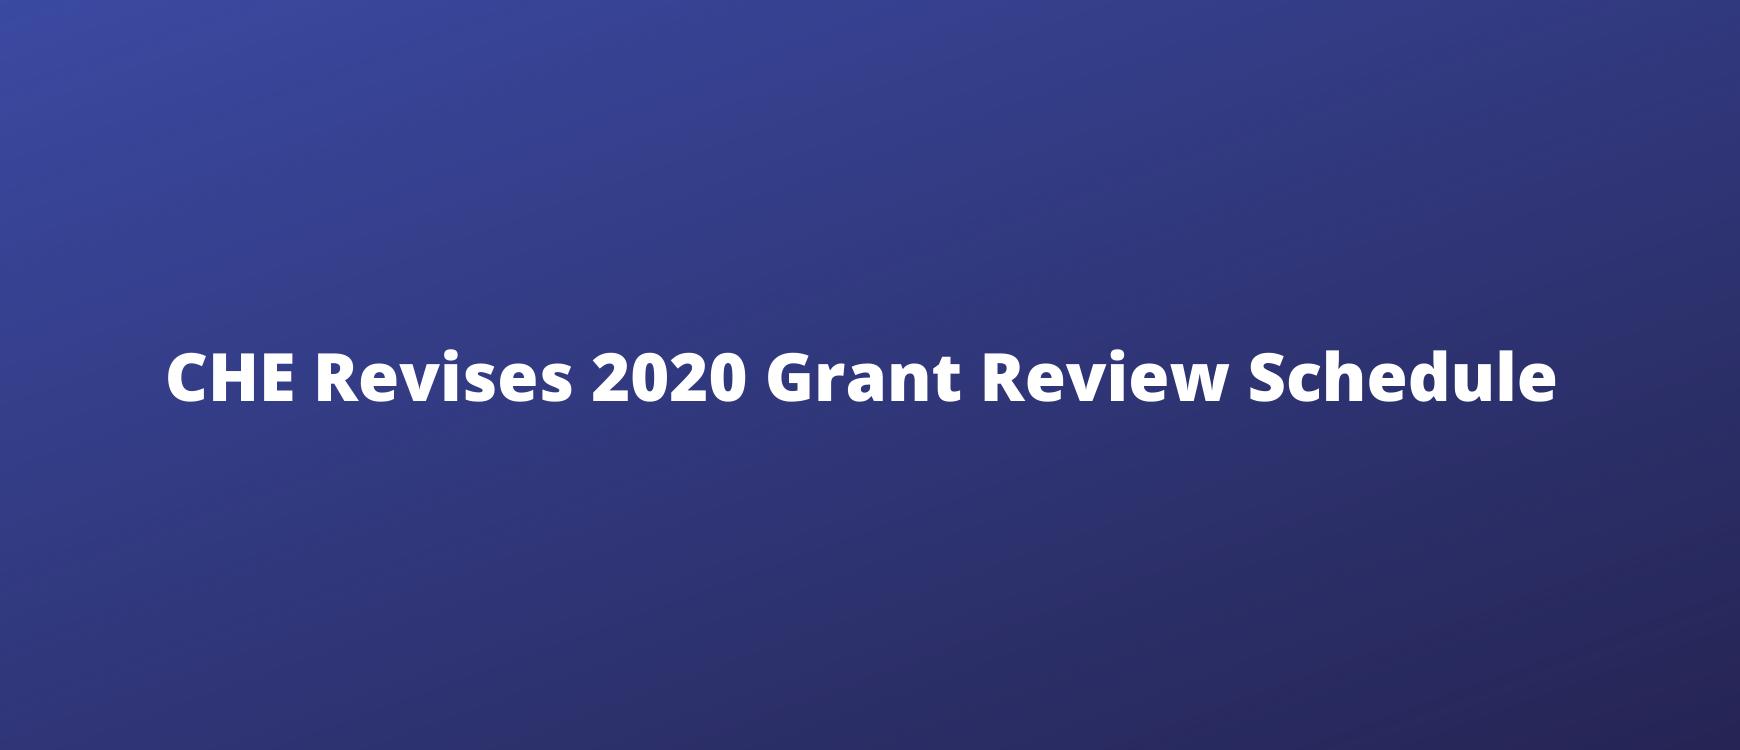 CHE Revises 2020 Grant Review Schedule